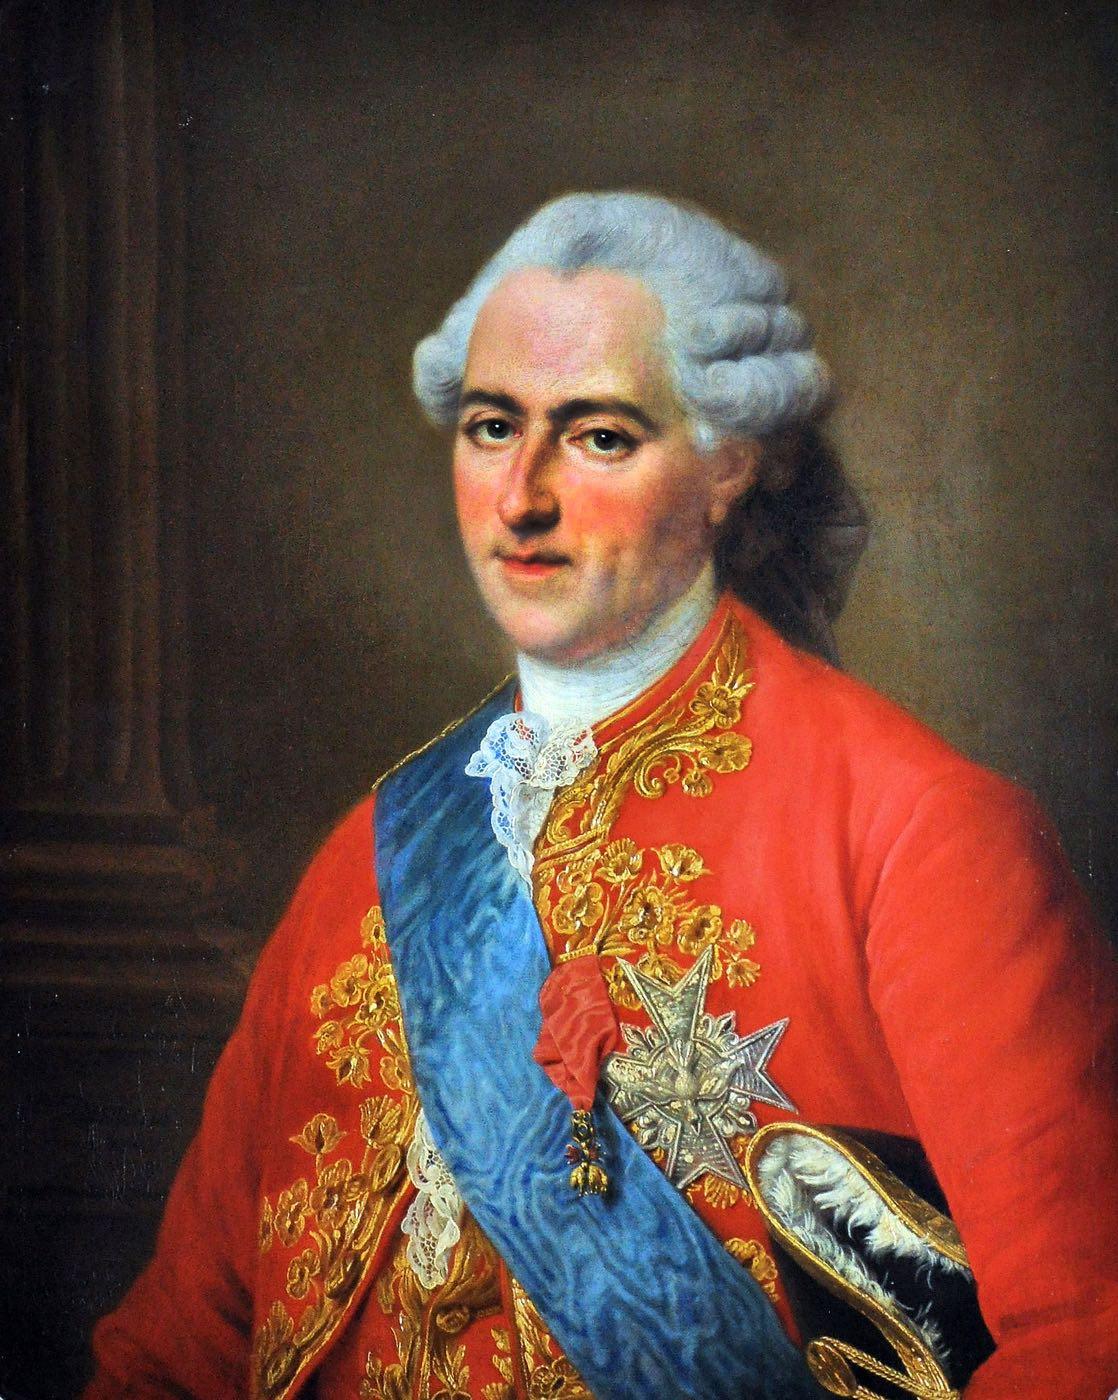 Ludwig XV, König, Frankreich, Rococo, François-Hubert Drouais, Portrait,